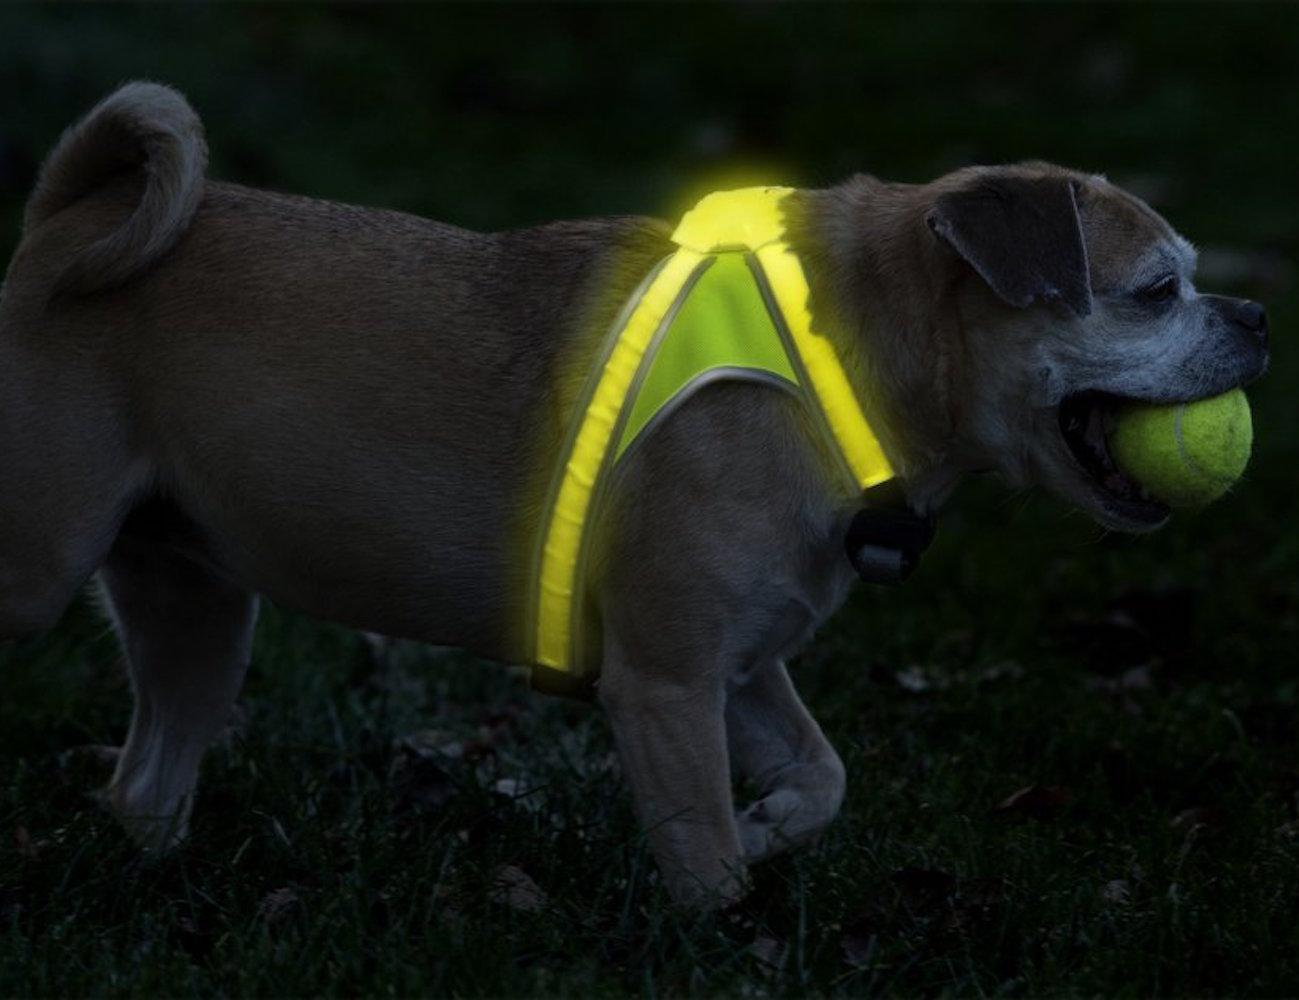 Noxgear LightHound Illuminated Dog Vest